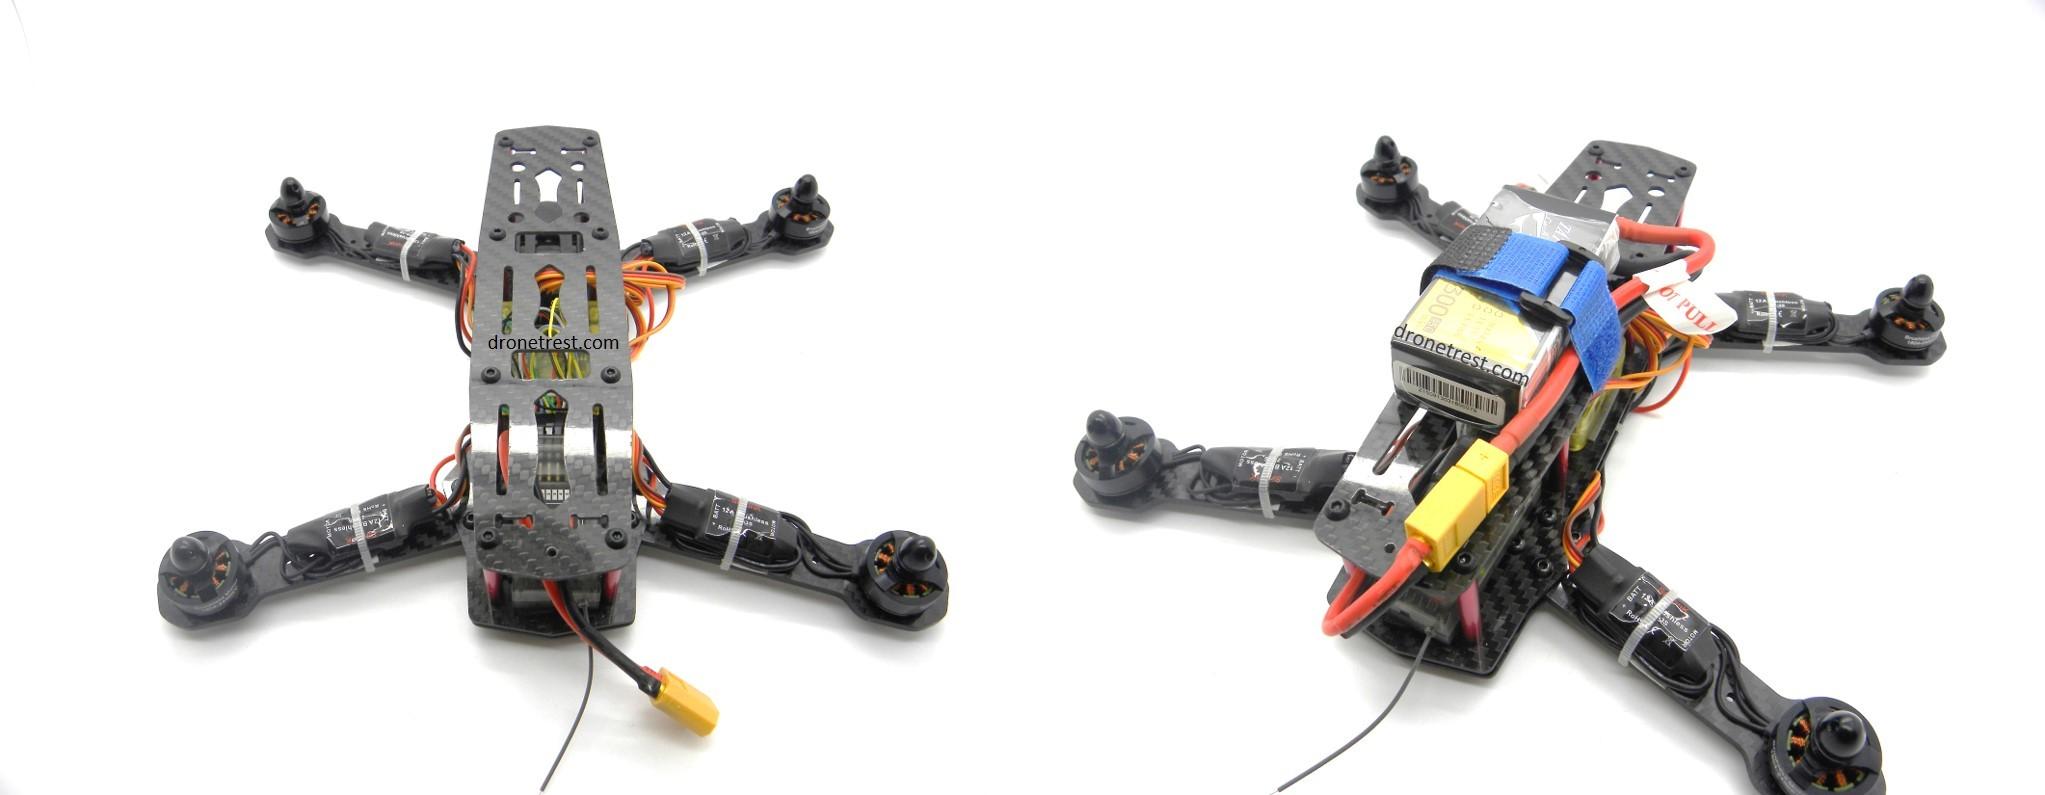 Qav Zmr 250 Assembly Build Guide Guides Dronetrest Cc3d Quadcopter Wiring Diagram Final 12045x795 156 Kb